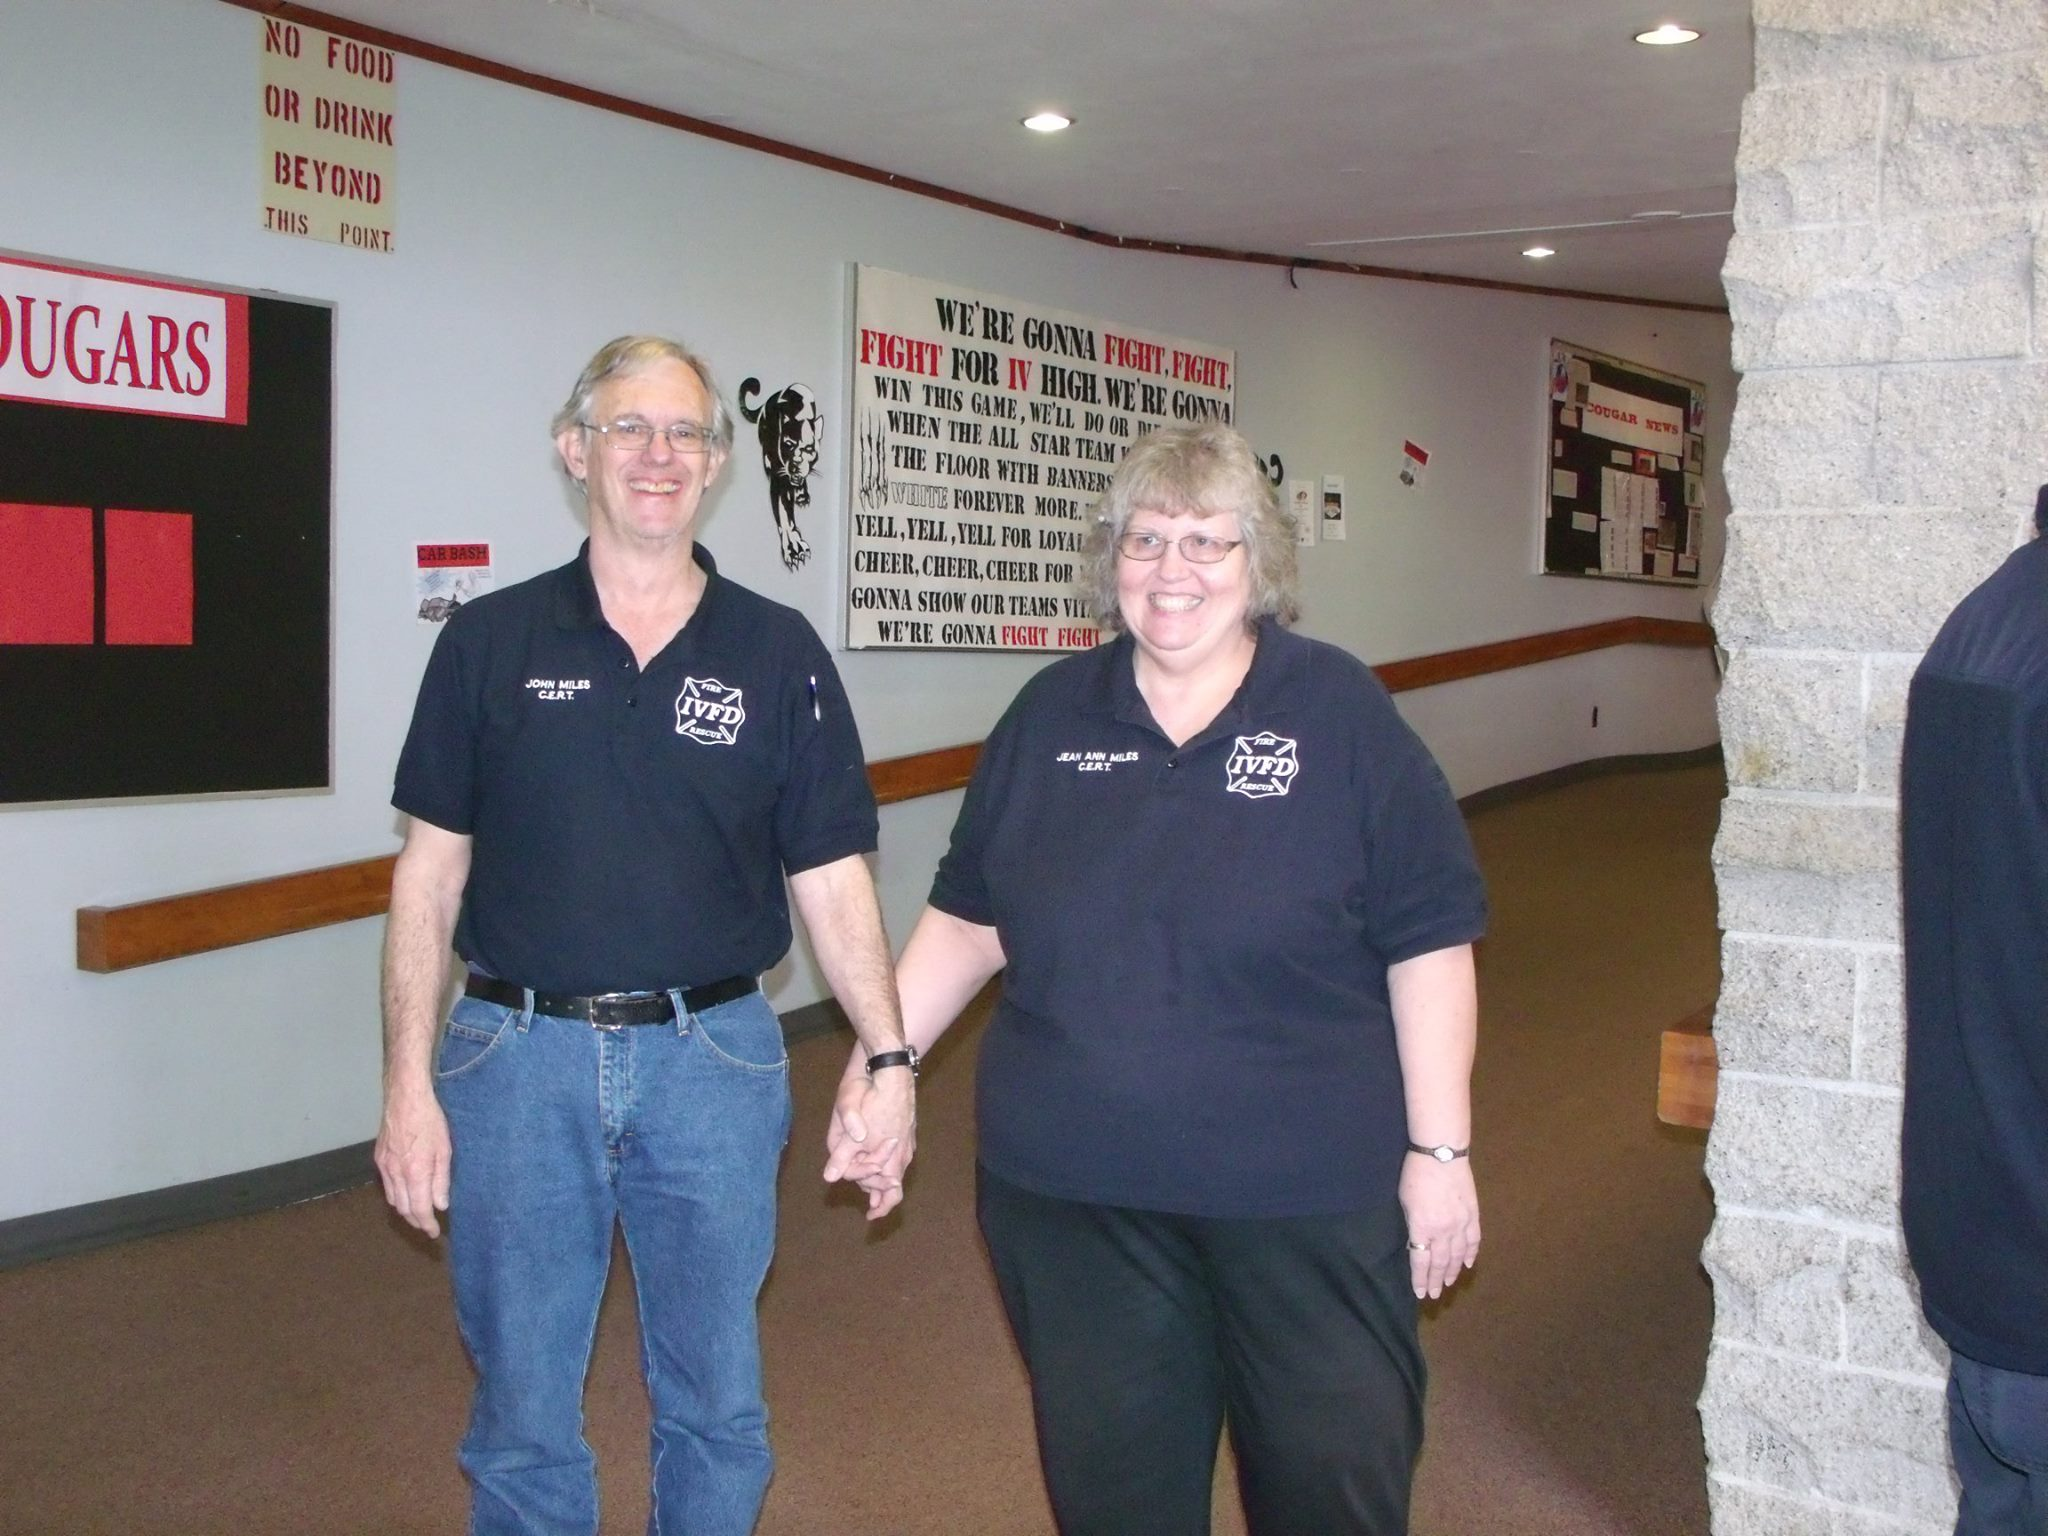 Organizers, Jean Ann and John Miles